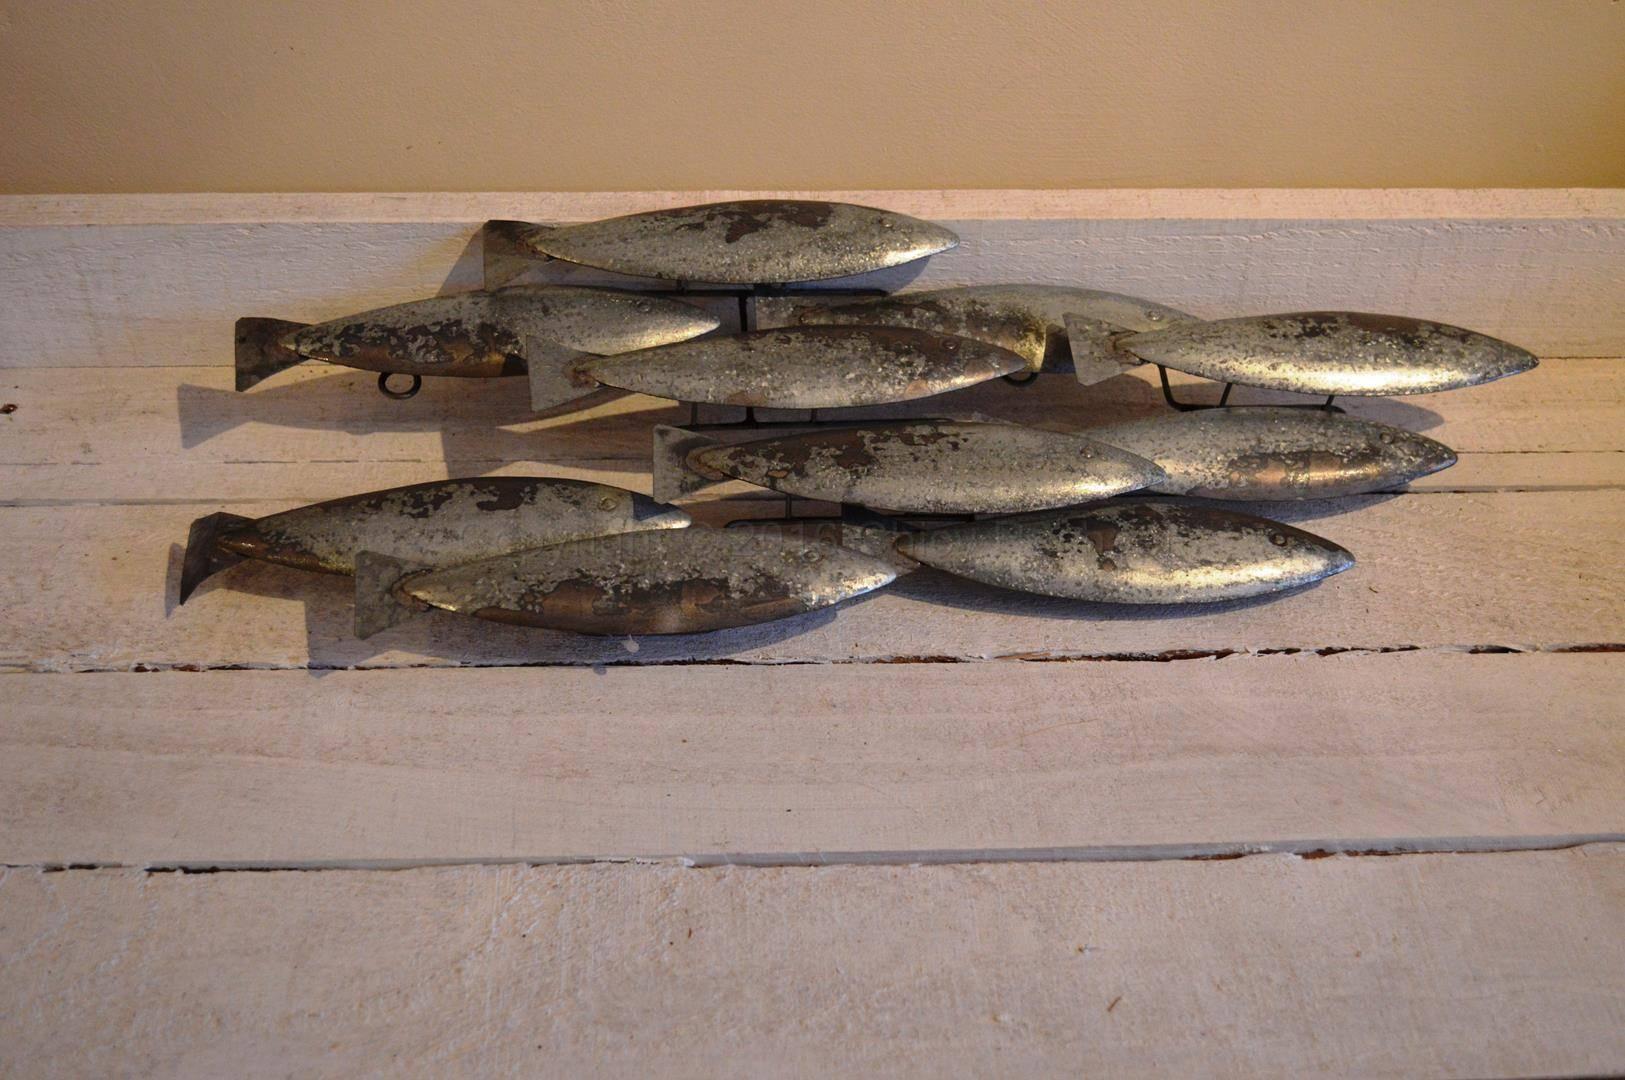 Metal School Of Fish Wall Art – Chicy Rachael Inside Most Recent School Of Fish Metal Wall Art (View 9 of 20)